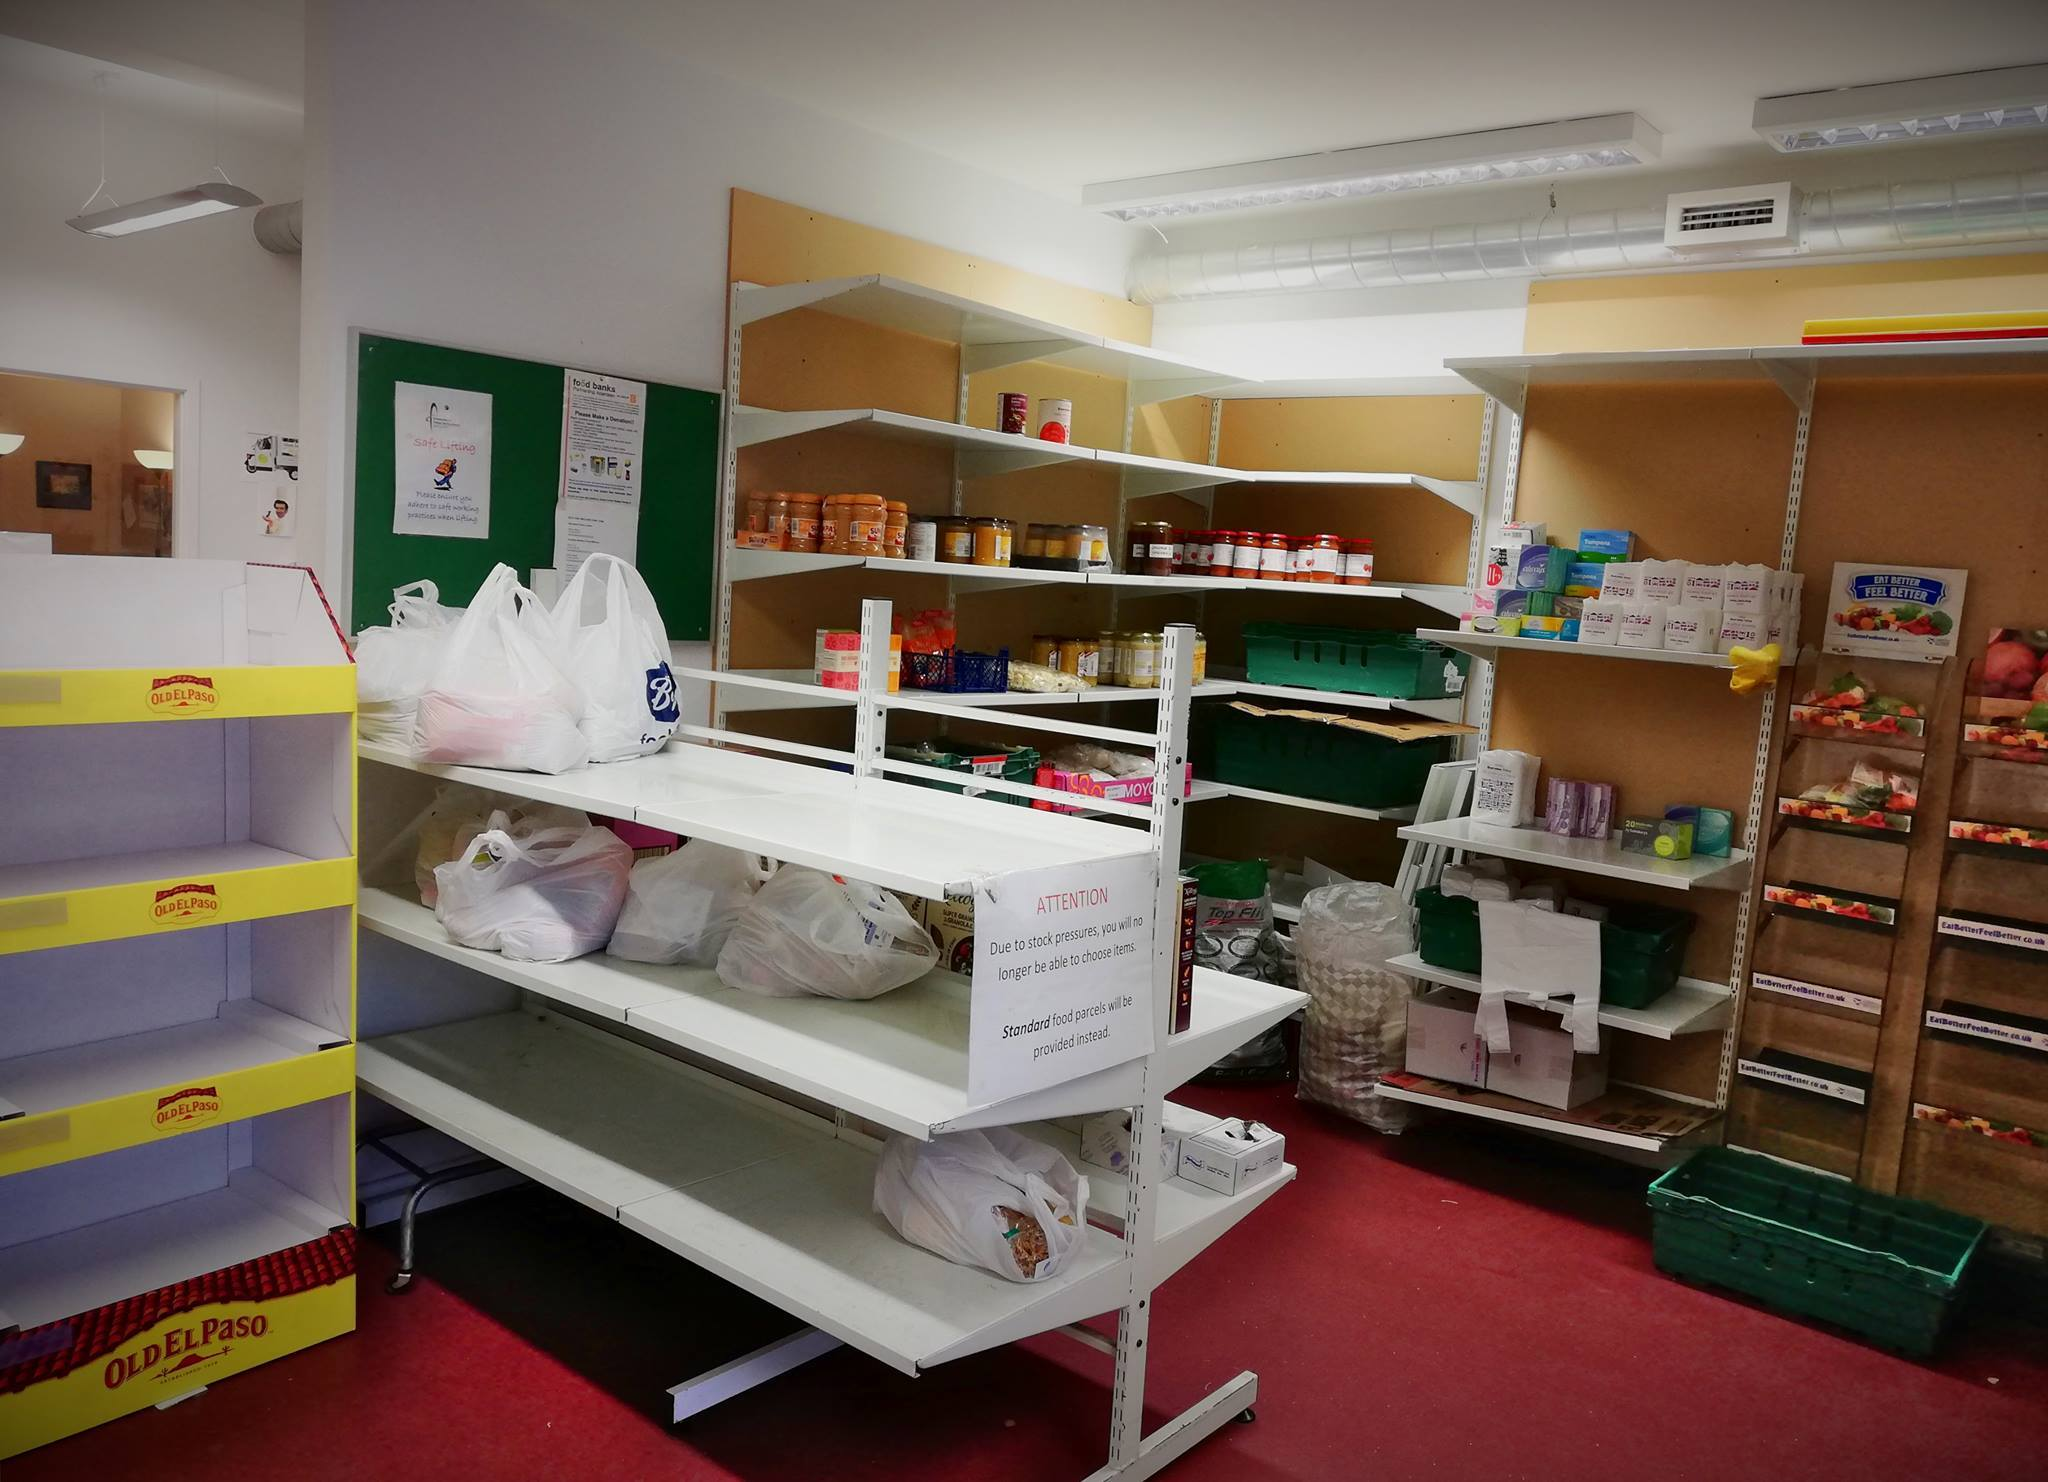 The empty shelves at CFINE